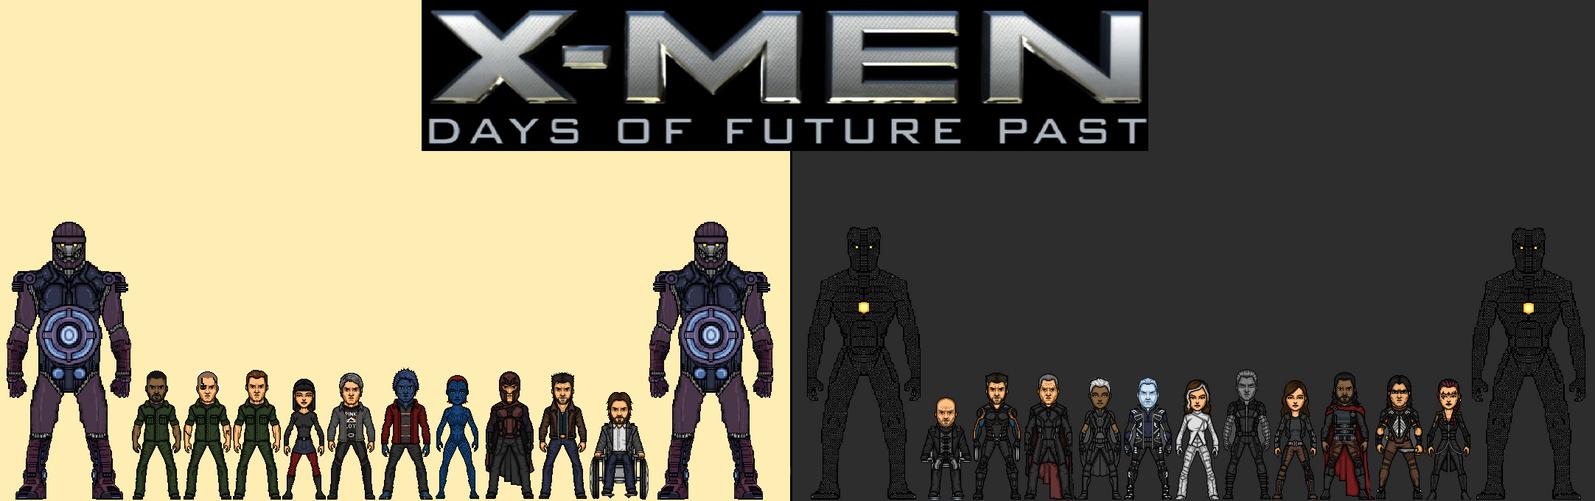 x-men days of future past by doctorstrange7 on DeviantArt